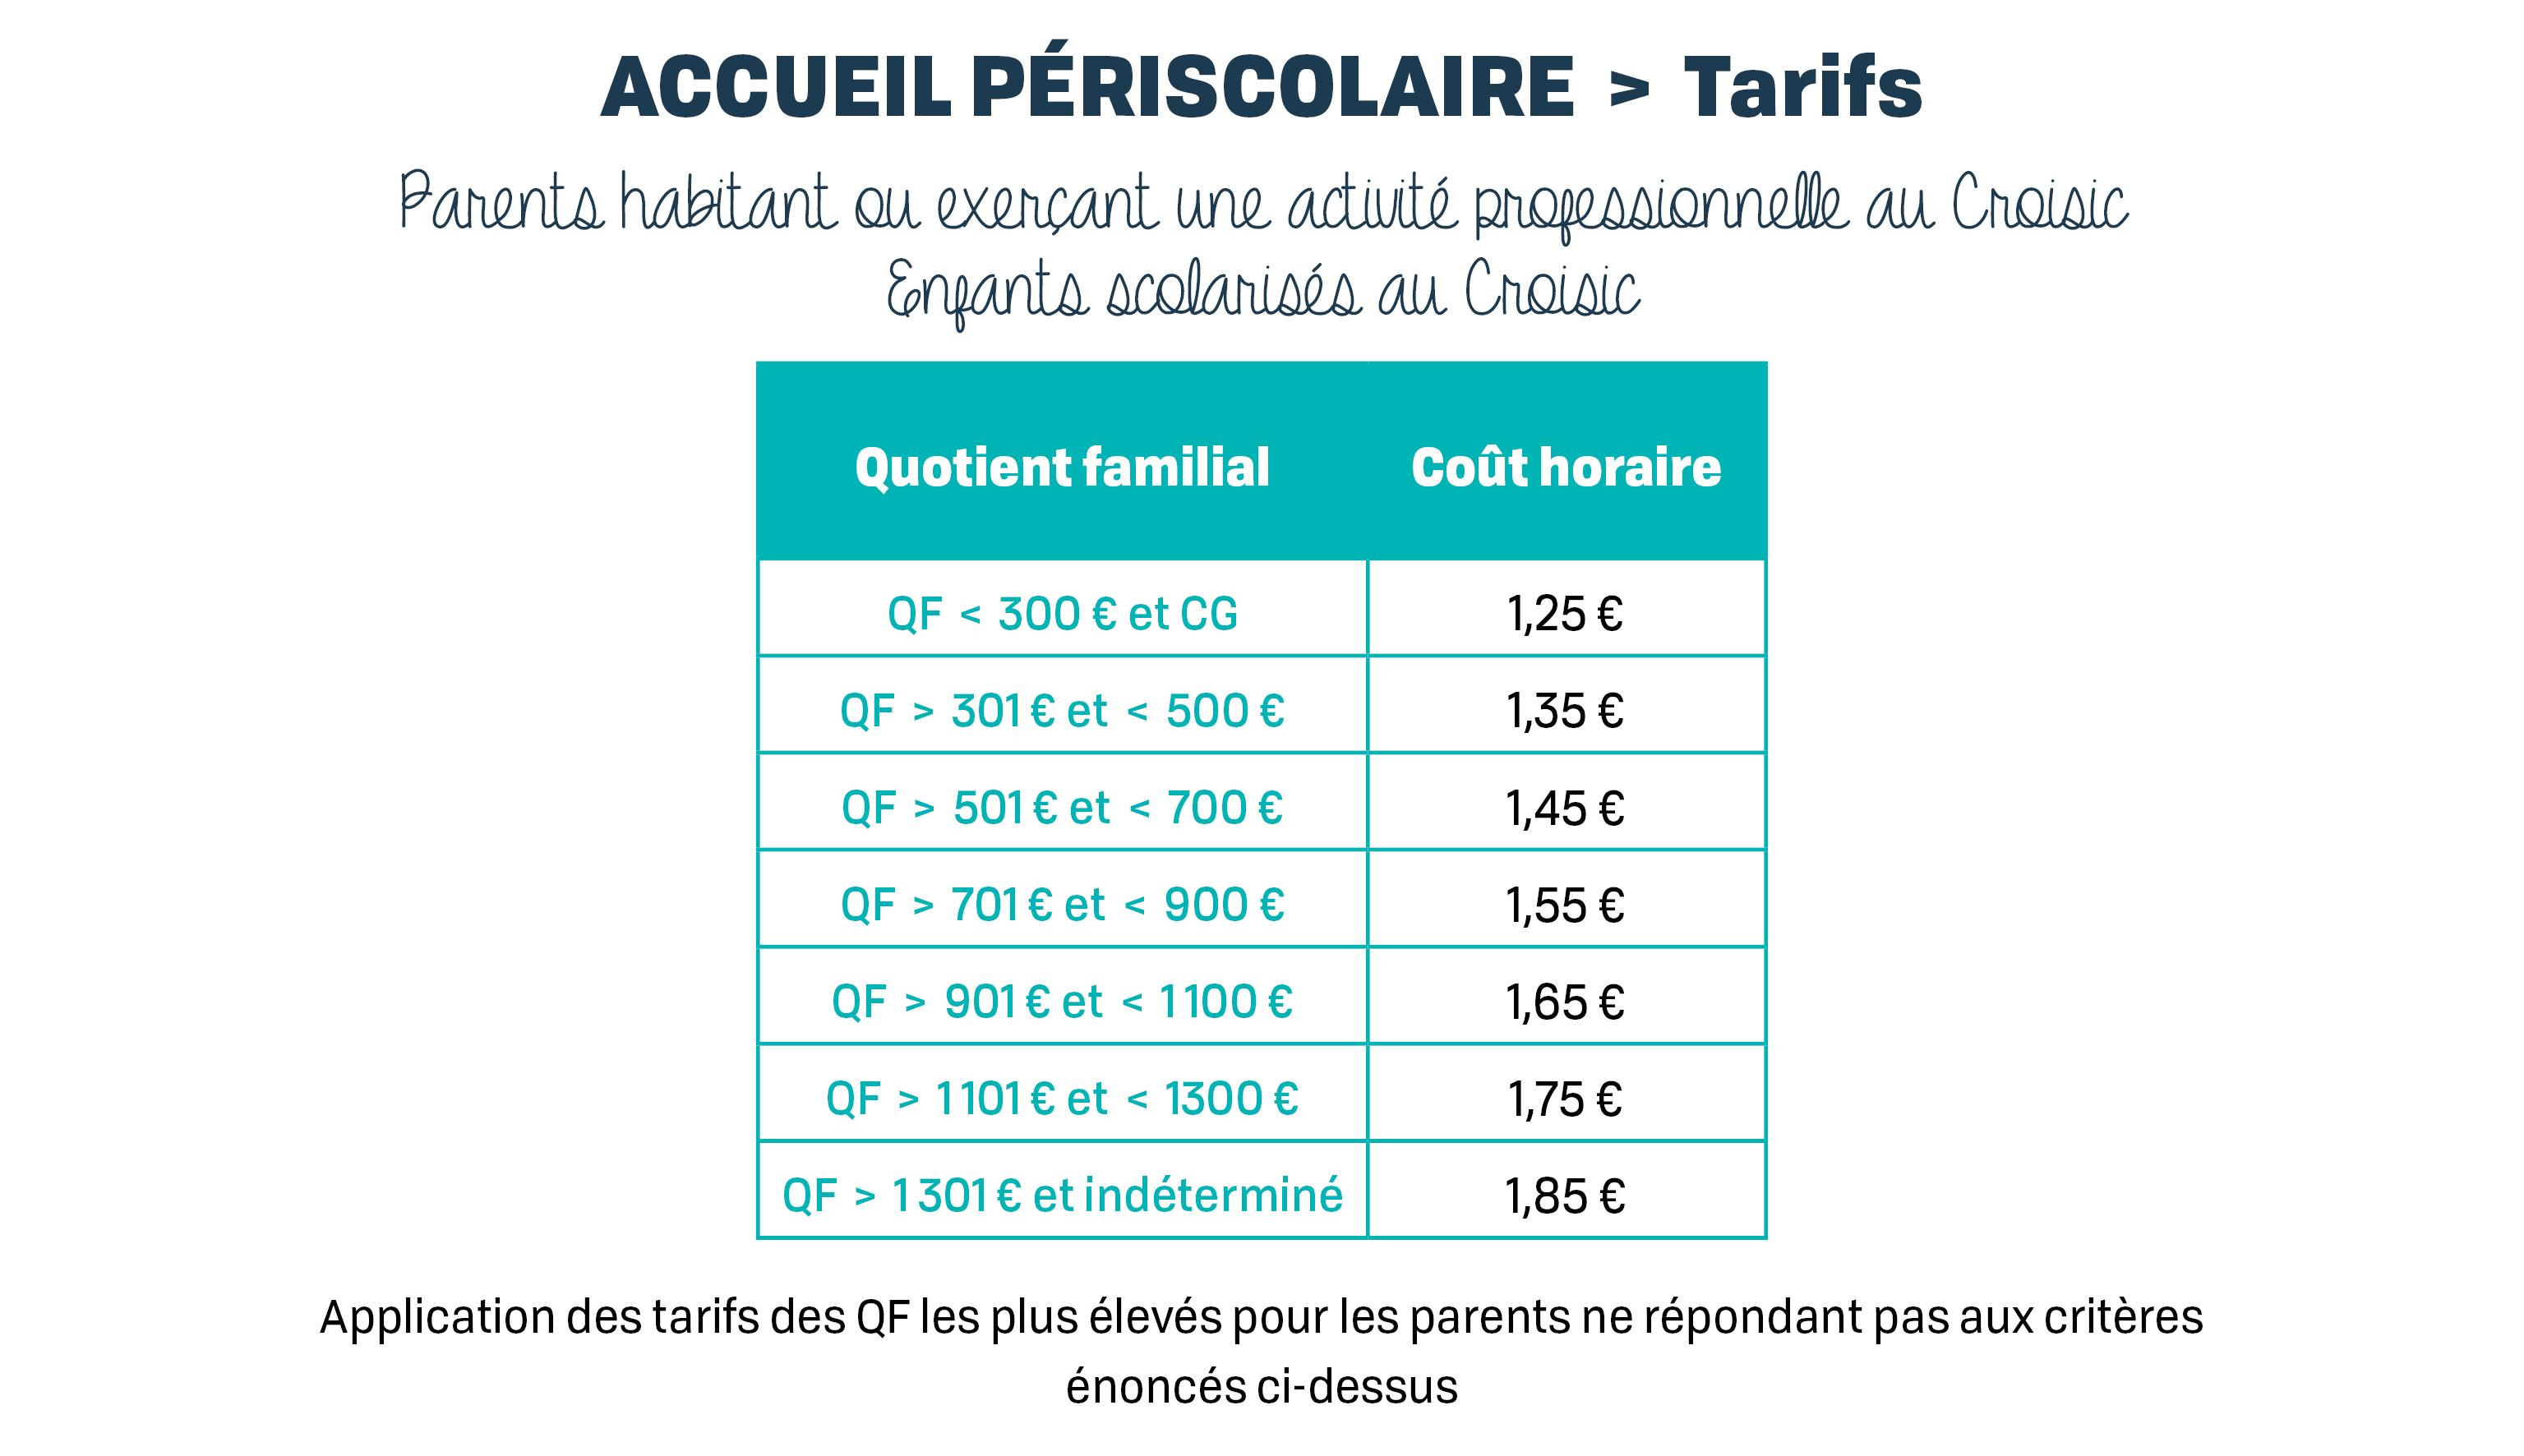 Tarifs - Accueil périscolaire.jpg